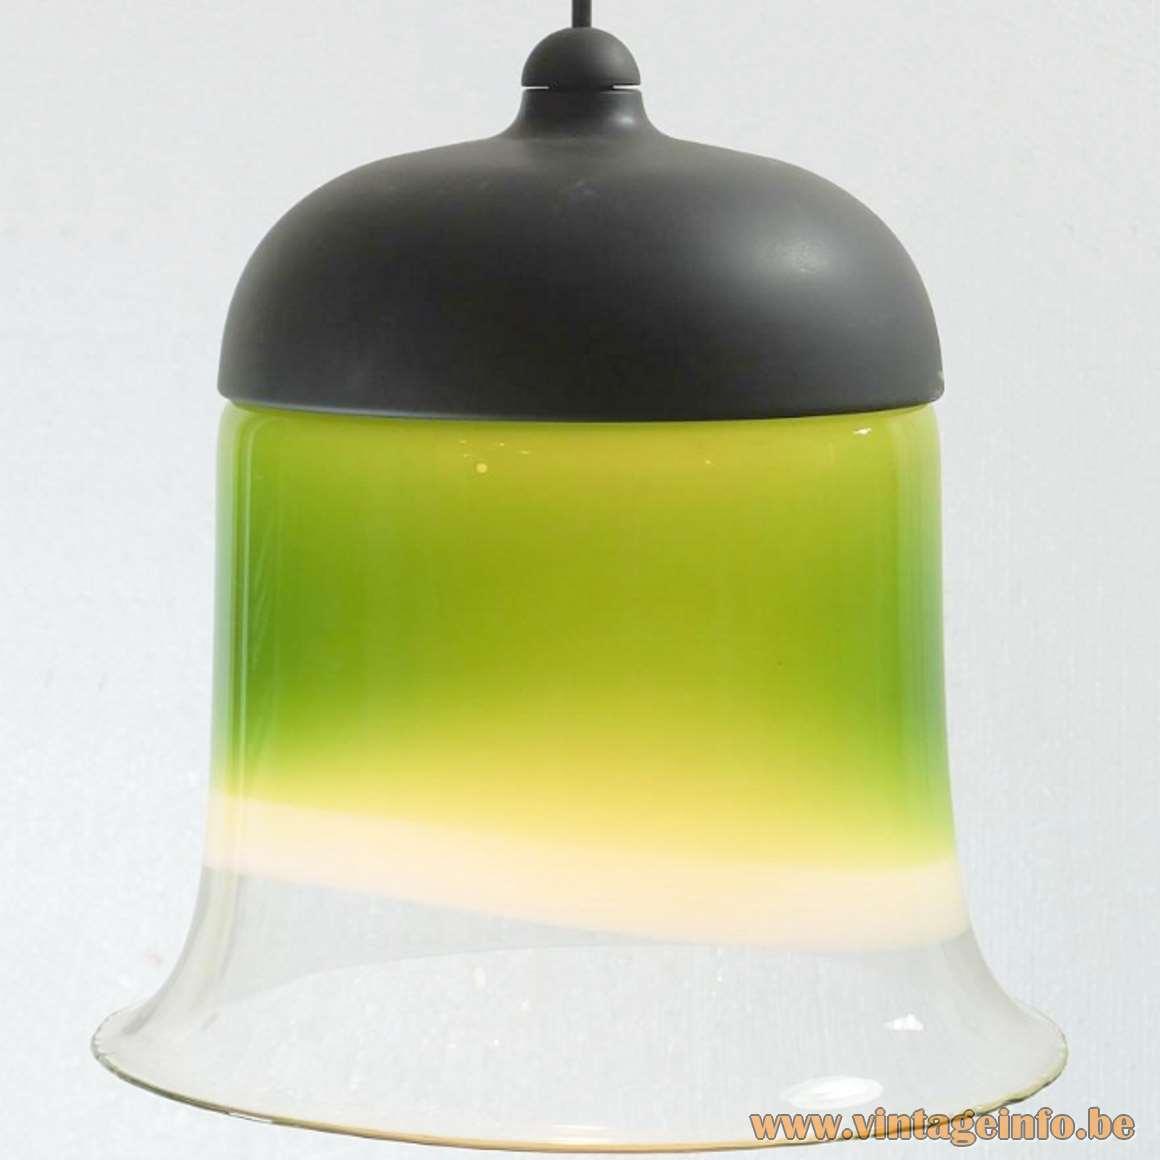 Peill + Putzler Bell Pendant Lamp clear below, coloured on top black plastic model AH182 1970s